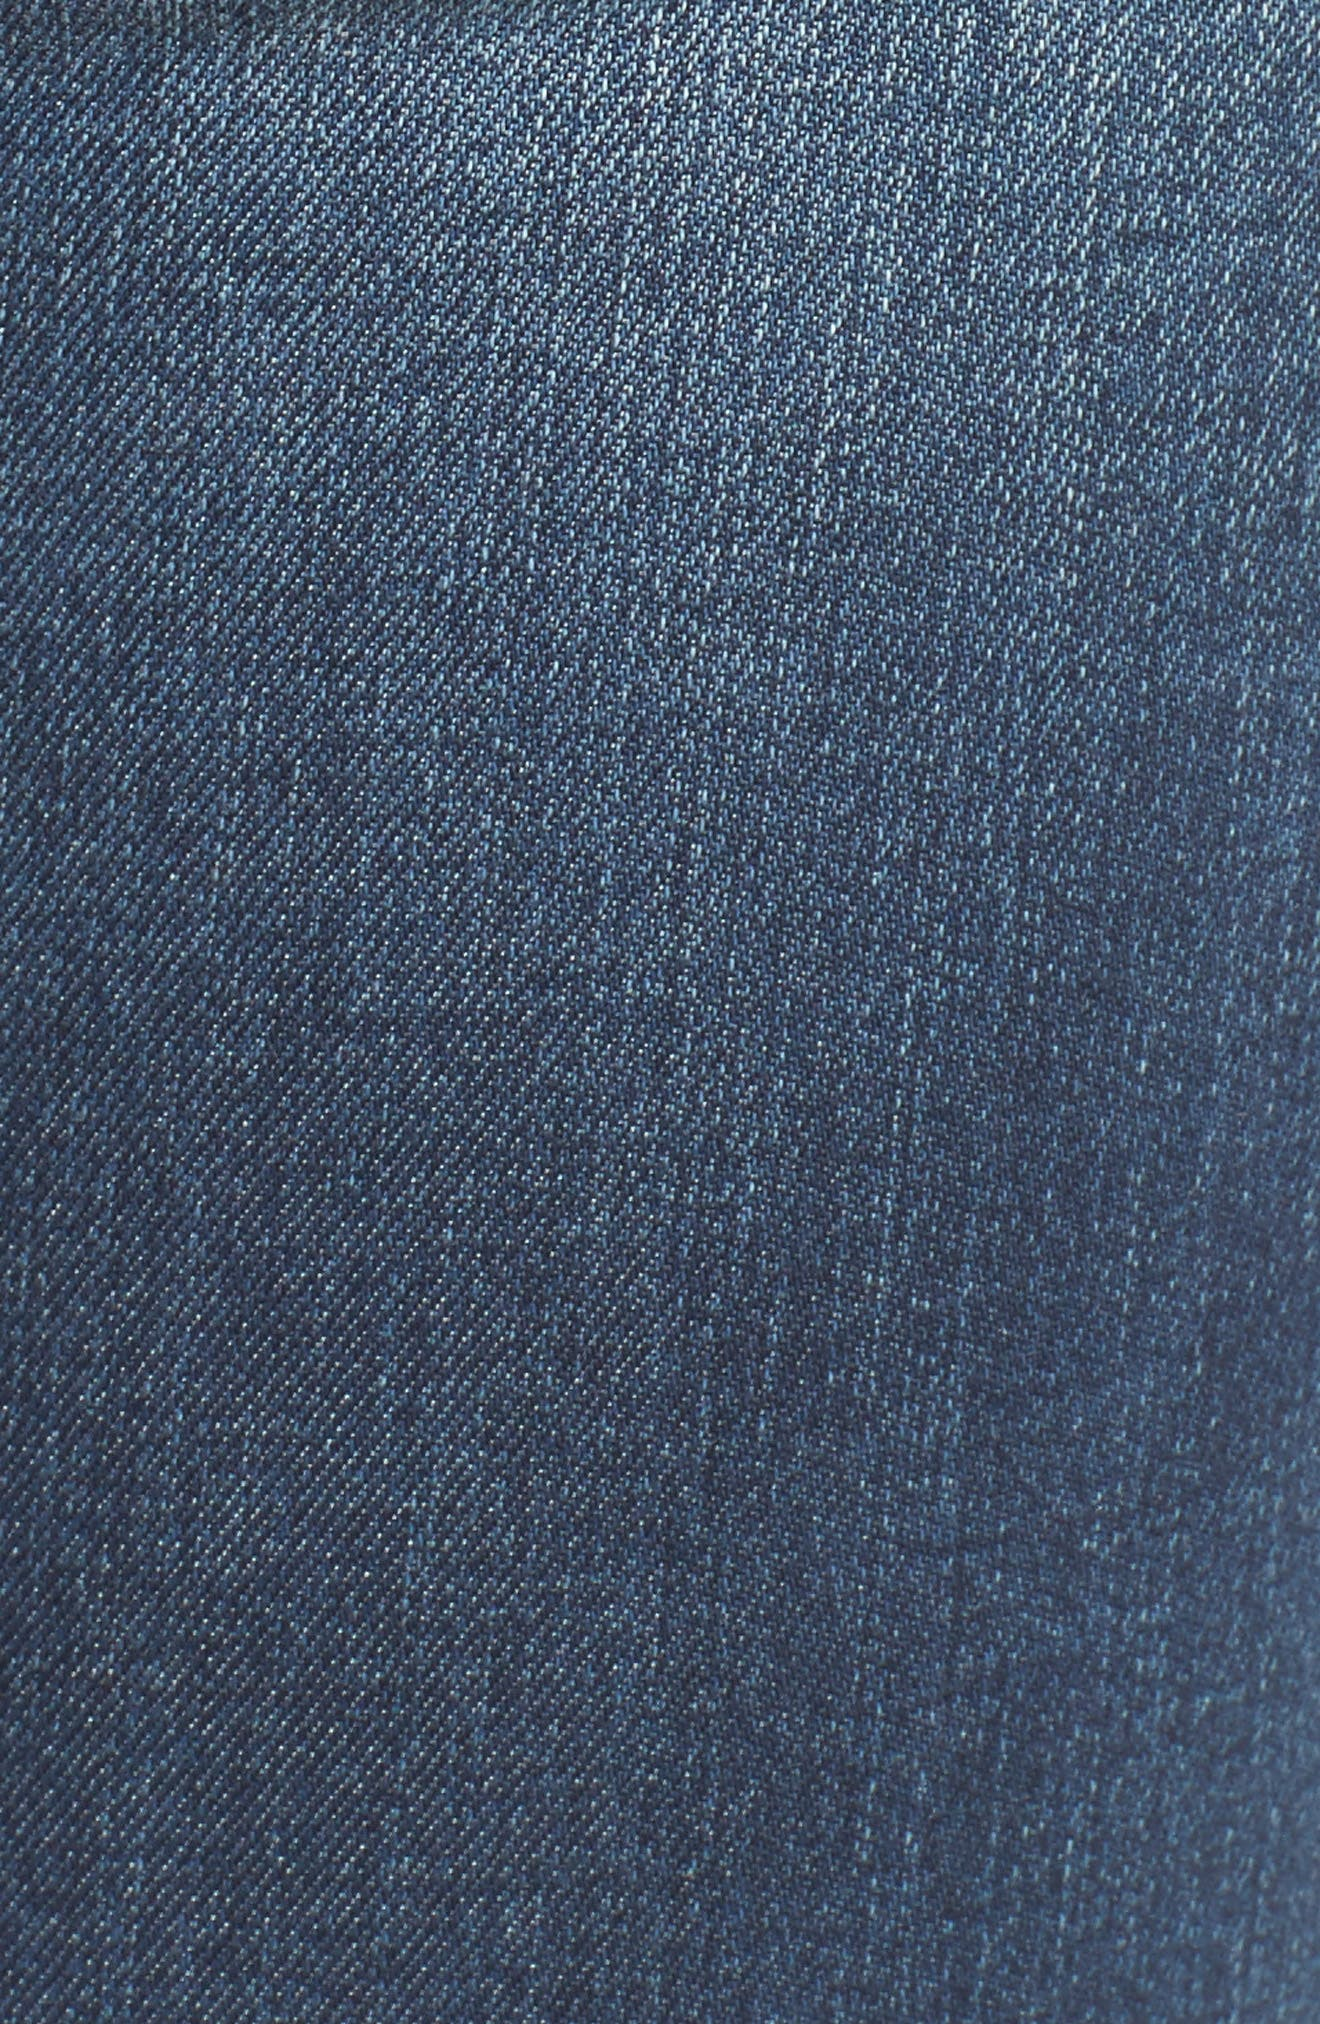 Sarah Shadow Pocket Distressed Skinny Jeans,                             Alternate thumbnail 6, color,                             Illusion